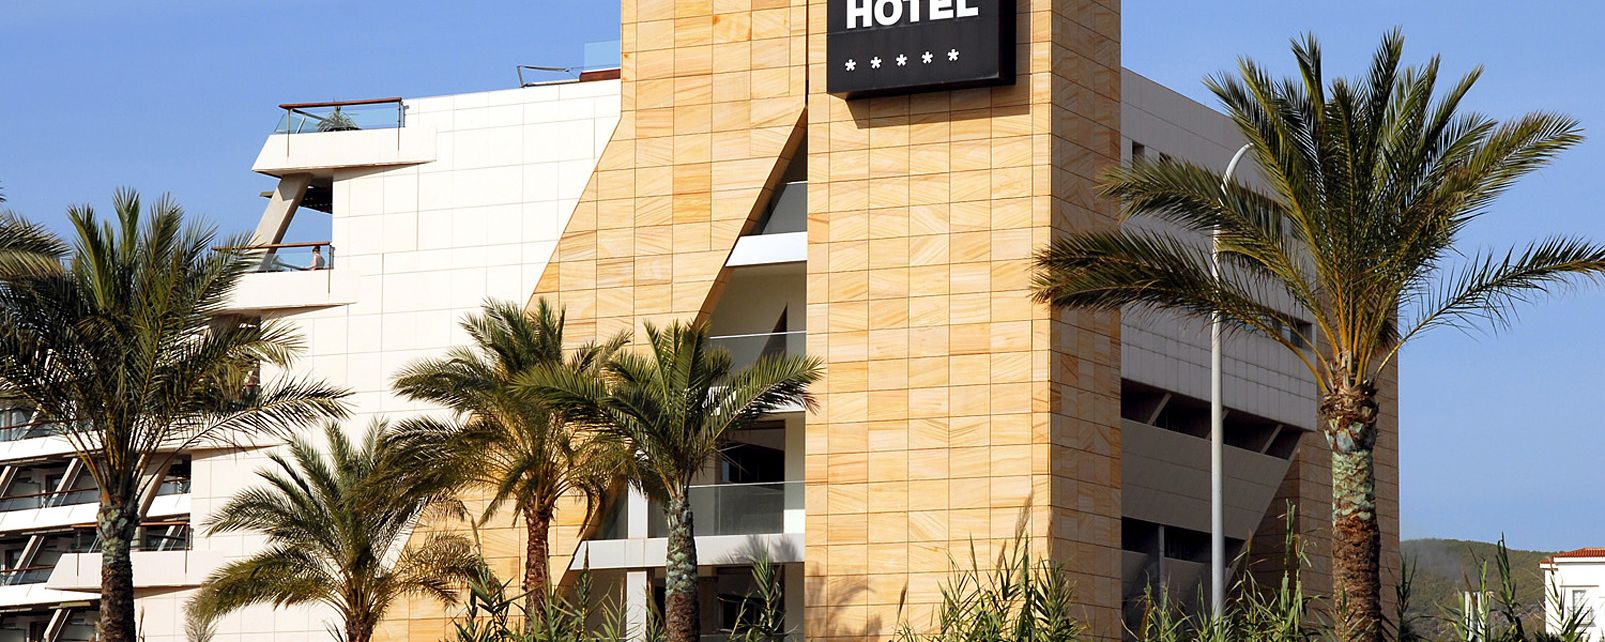 hotel ibiza grand hotel. Black Bedroom Furniture Sets. Home Design Ideas